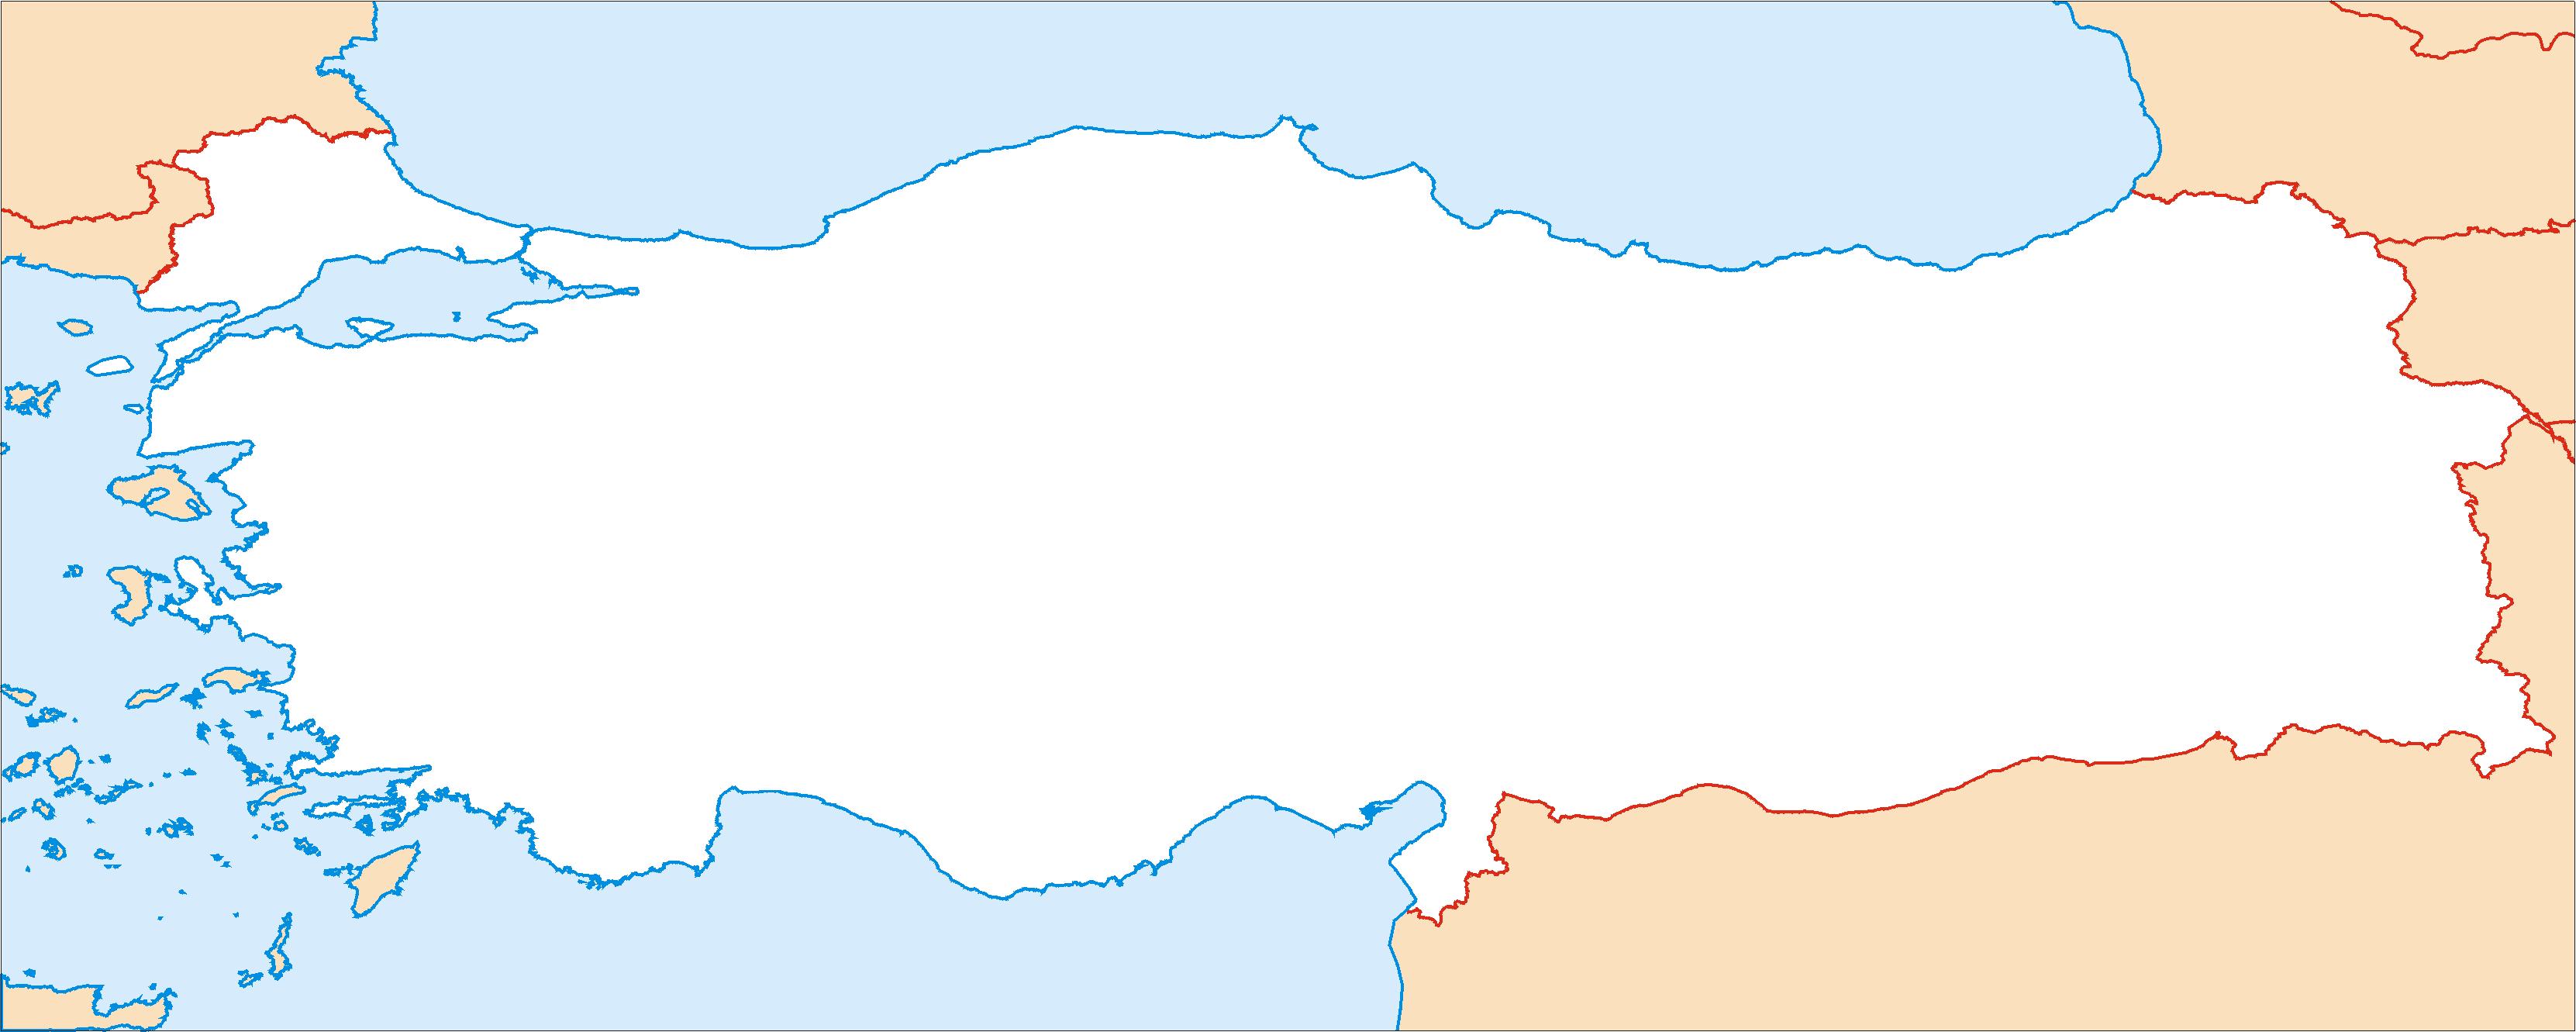 Turkey-pozKarta Blank Map Of Europe With Regions on blank map of latin america, blank map of china, blank map of middle east, blank map of uk, blank map of north america, blank european political map of the 1950, blank map of asia, europe's regions, blank map of japan, blank map of oceania, blank usa map regions, blank concept map, blank map of africa, blank map of singapore, blank world map regions, blank map of russia, blank map middle east regions, blank map of usa, blank map of australia, blank united states map regions,